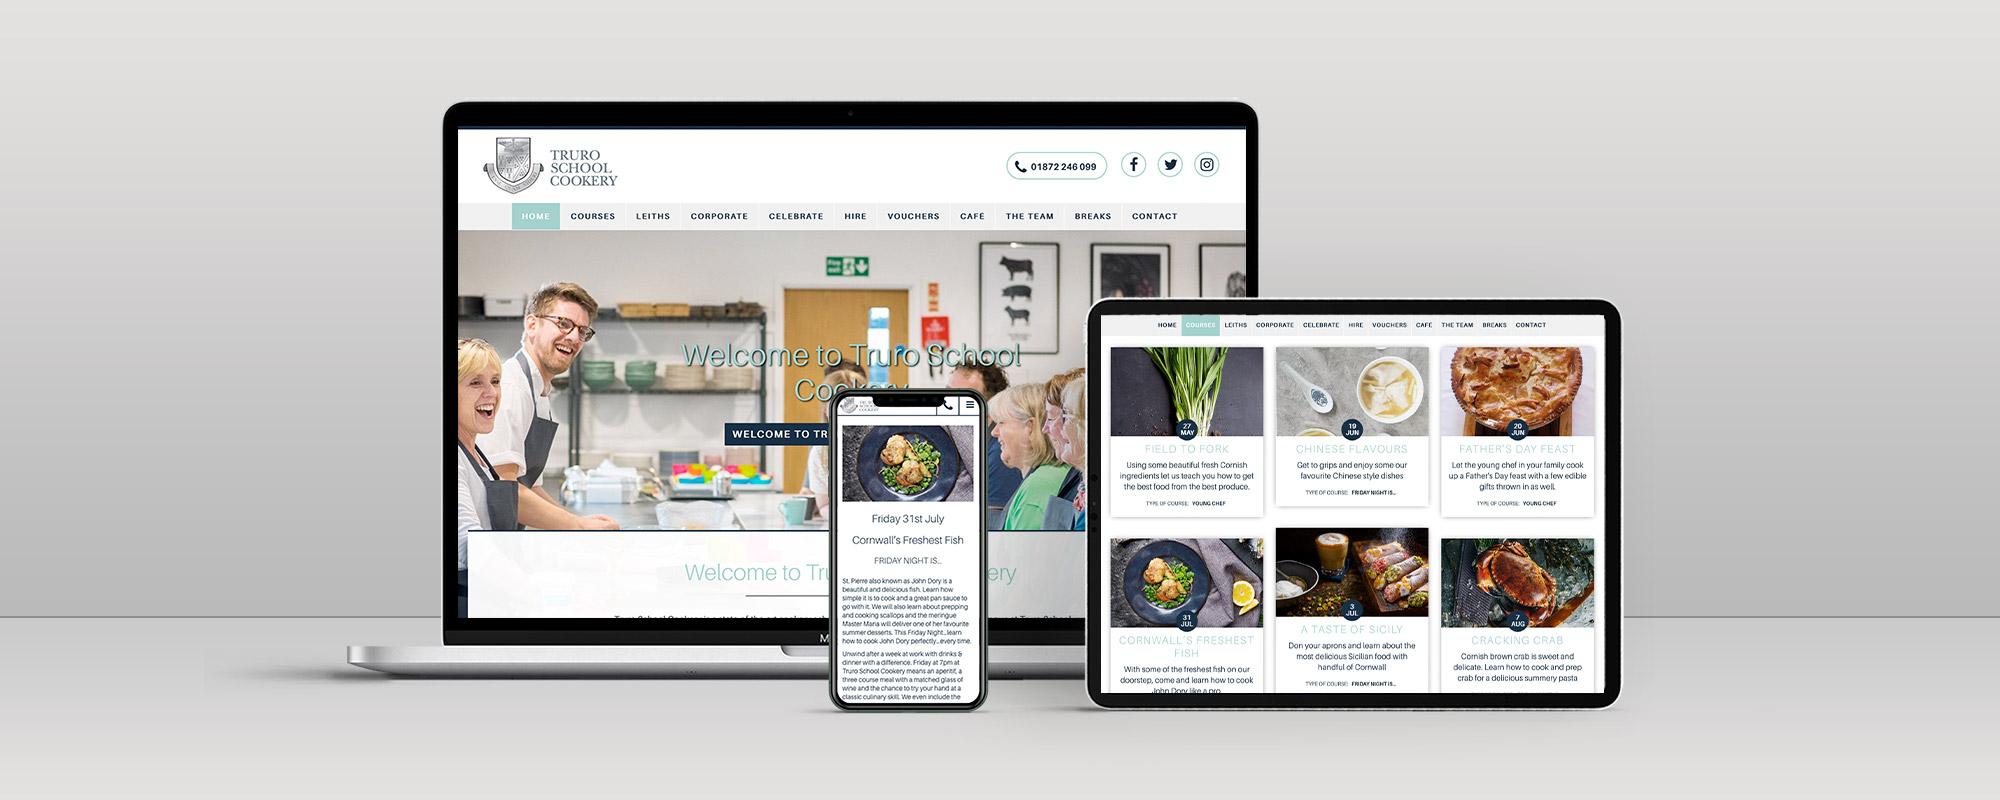 Truro School Cookery Wordpress Website Design on 3 Devices